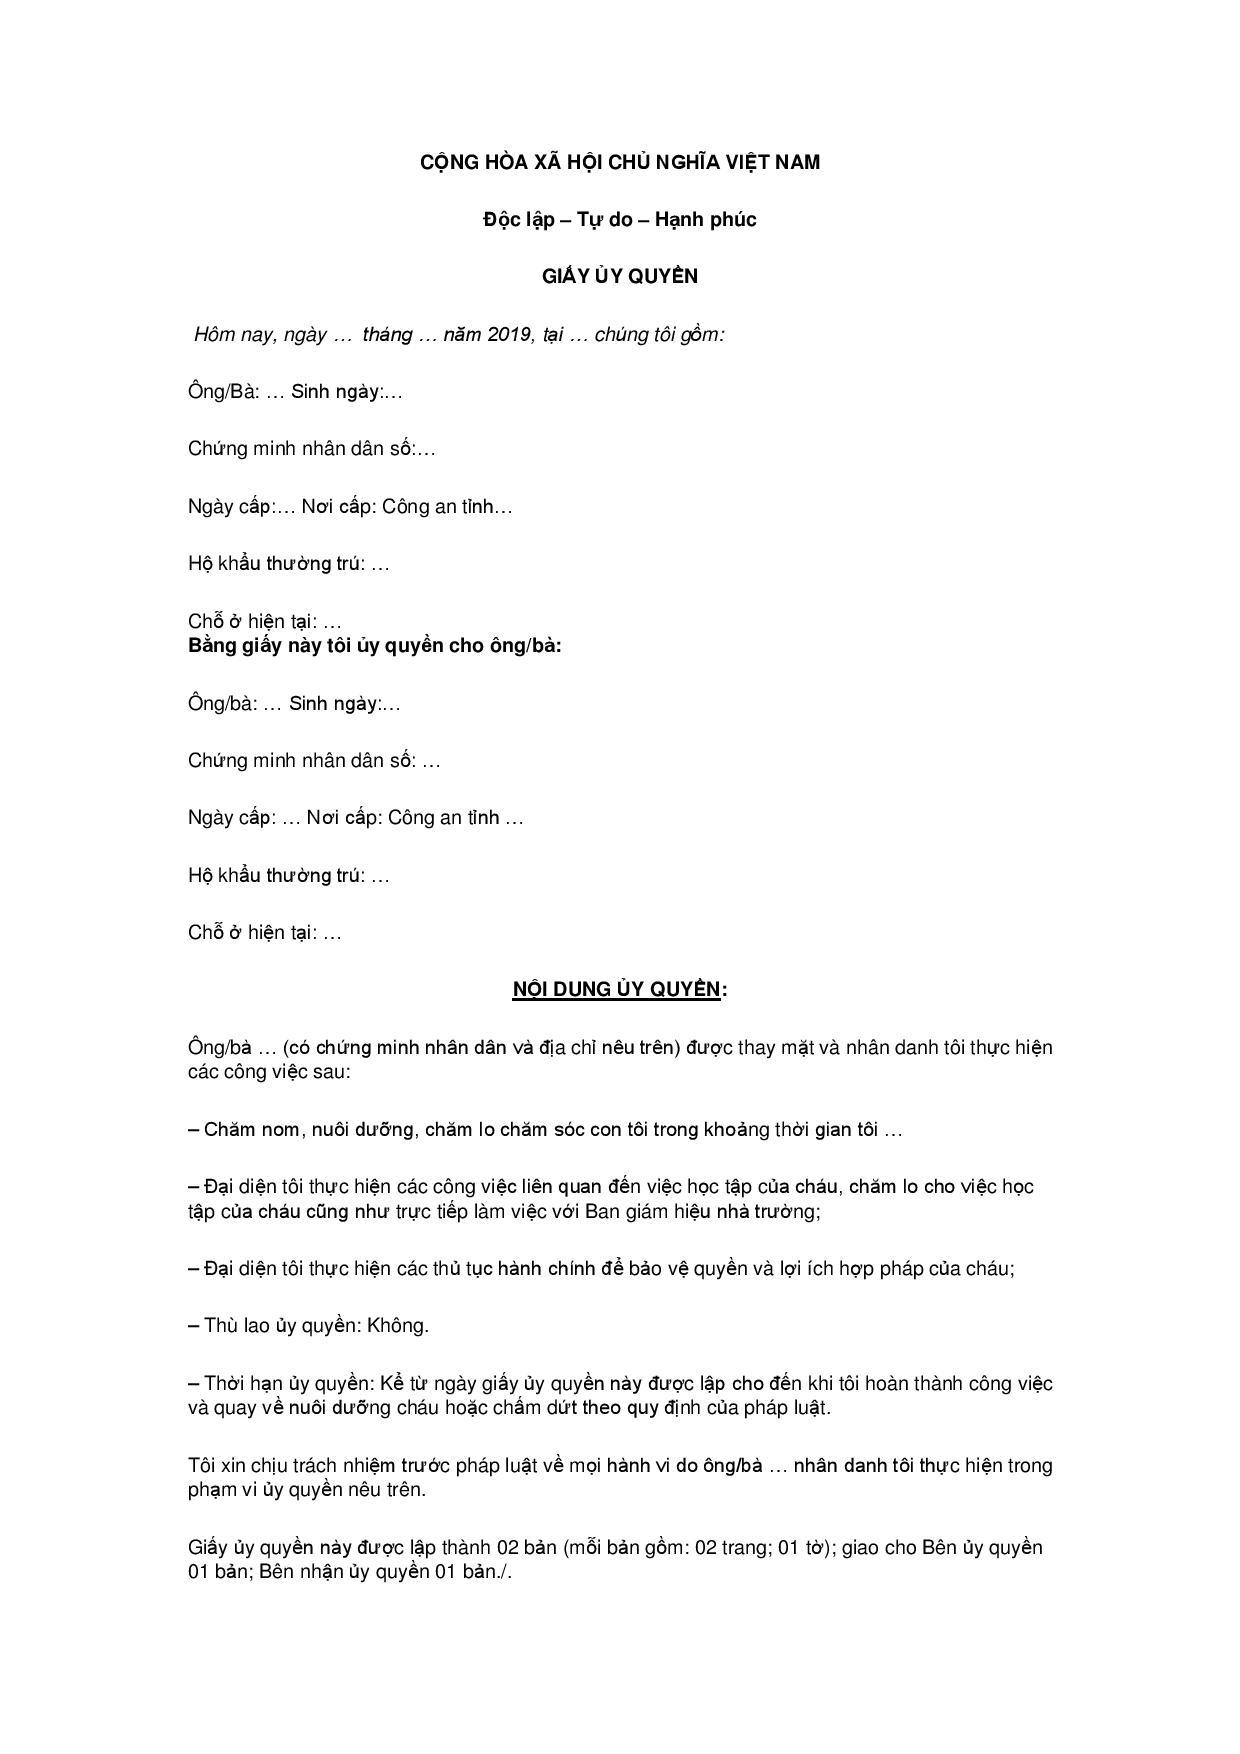 Mẫu giấy ủy quyền nuôi con sau ly hôn